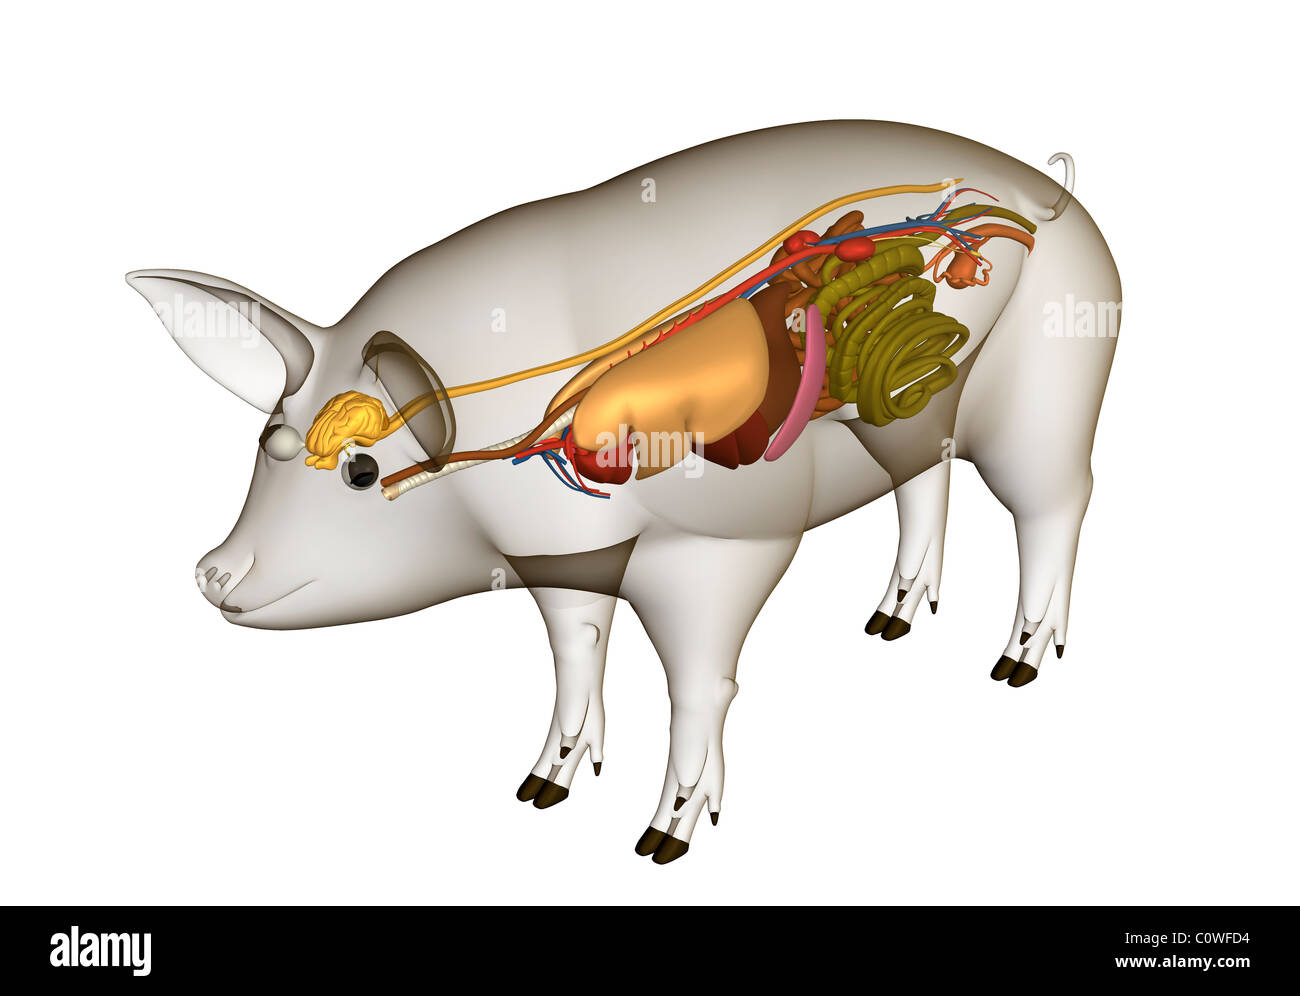 pig anatomy organs with transparent body Stock Photo: 34981664 - Alamy